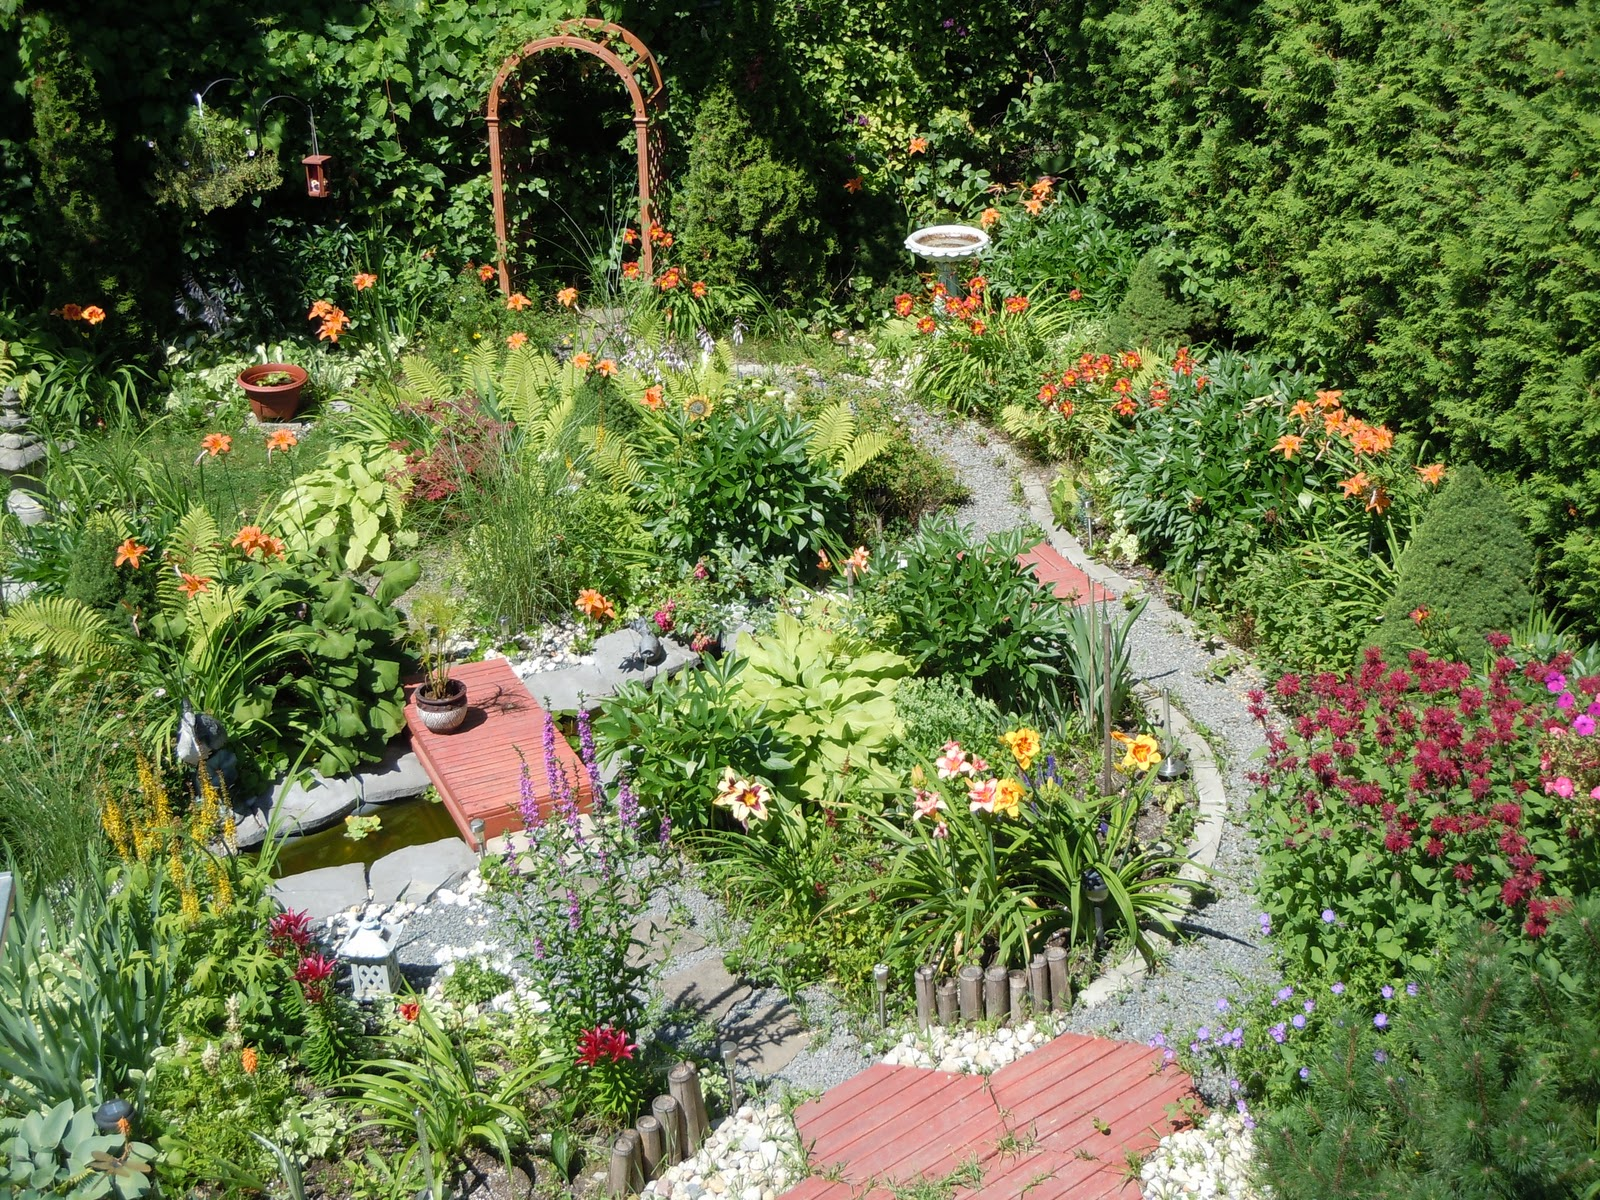 visionphotorama mon jardin au mois de juillet my garden in july. Black Bedroom Furniture Sets. Home Design Ideas